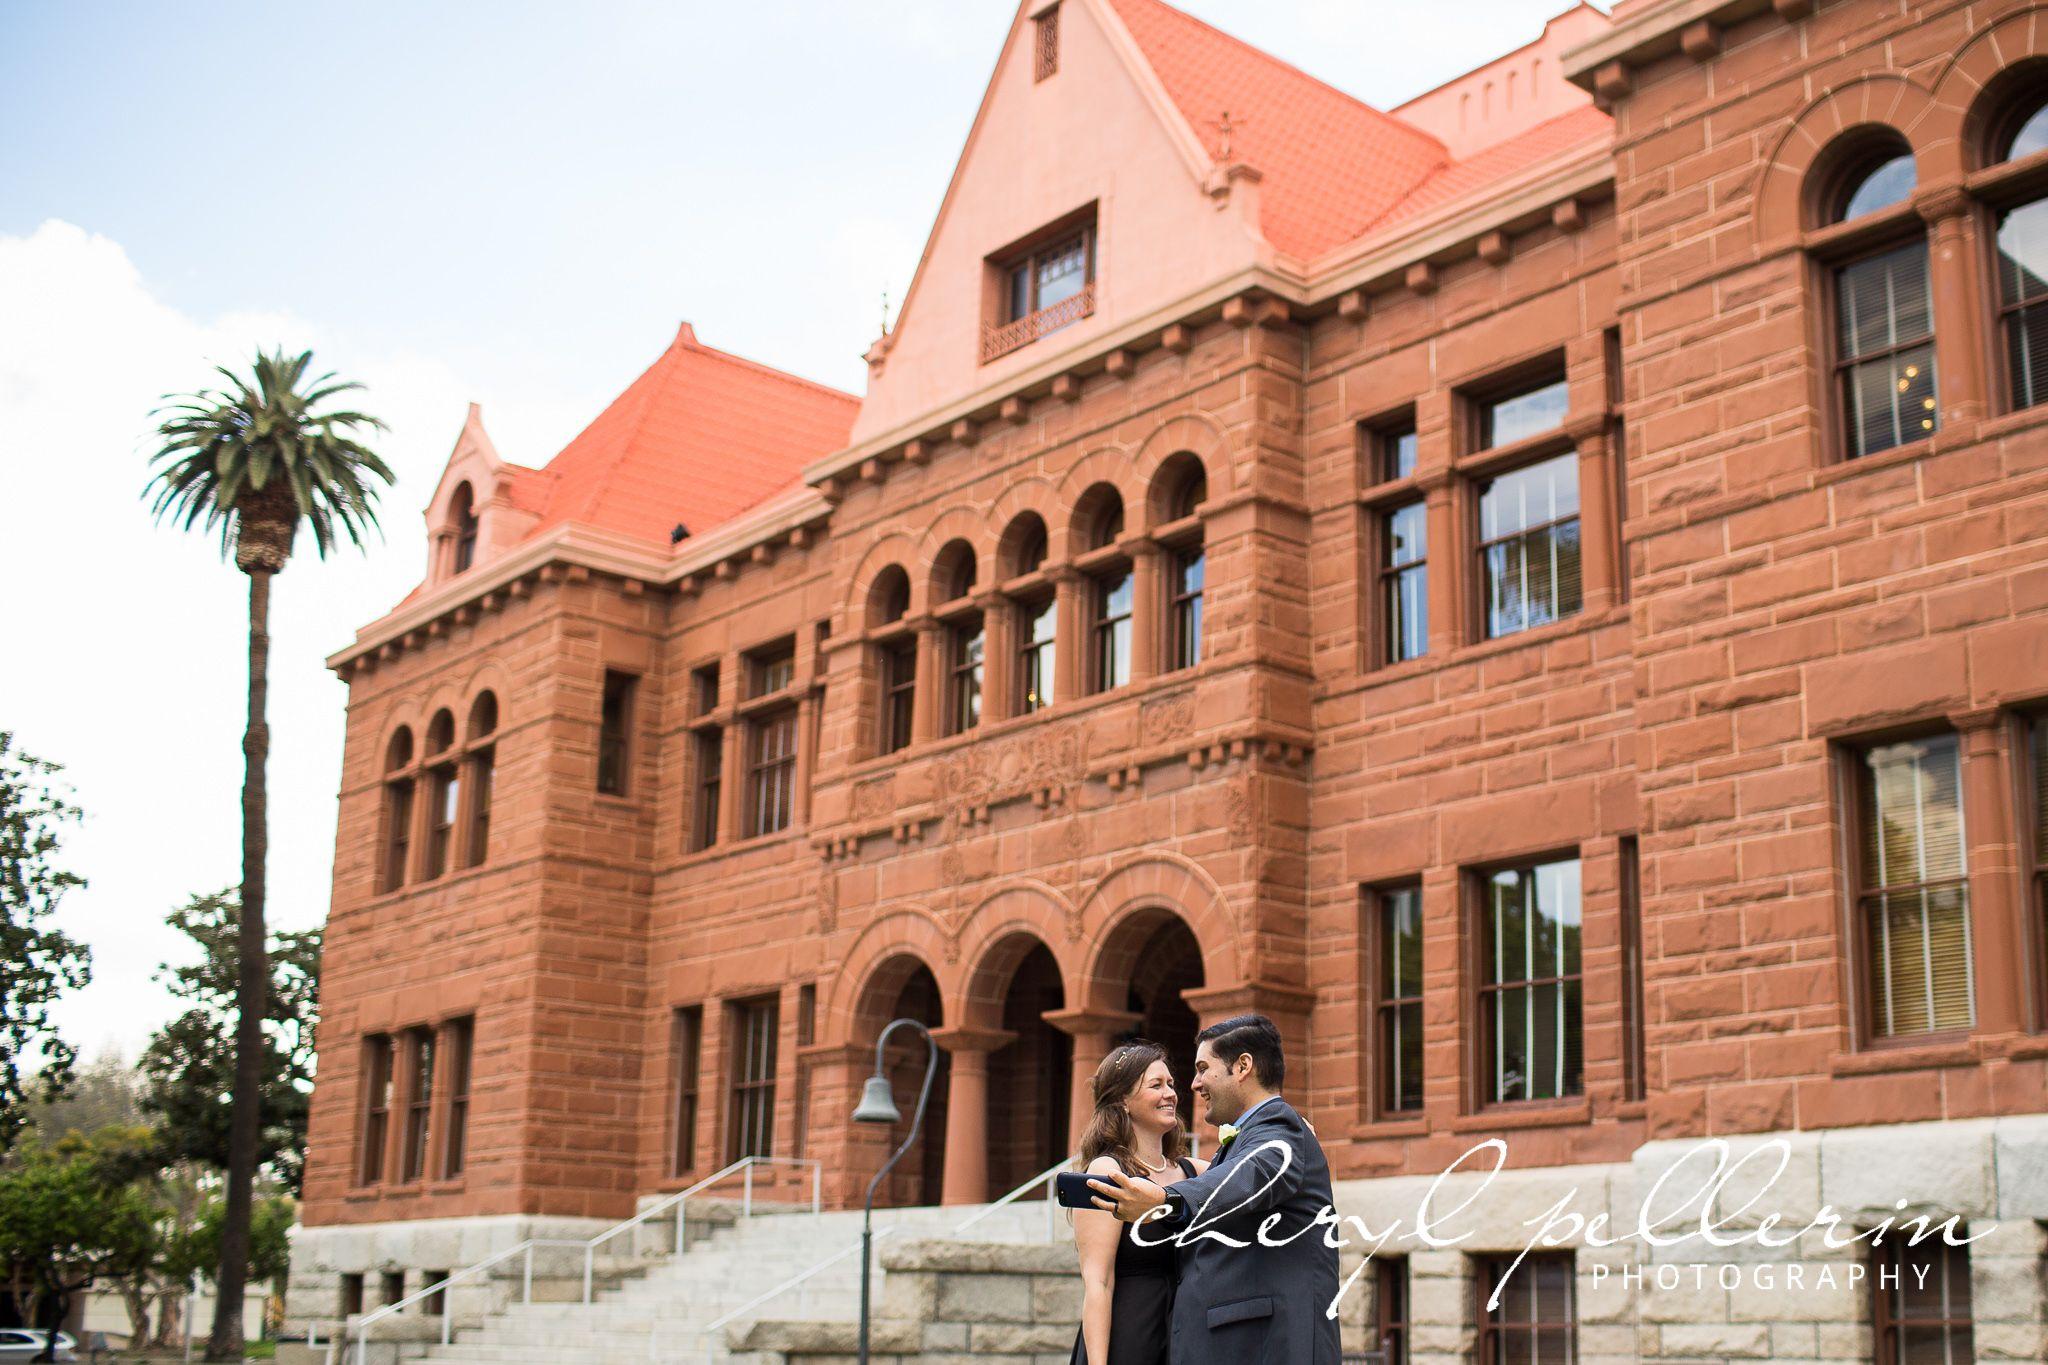 Old Orange County Courthouse | Orange county, Courthouse, Olds